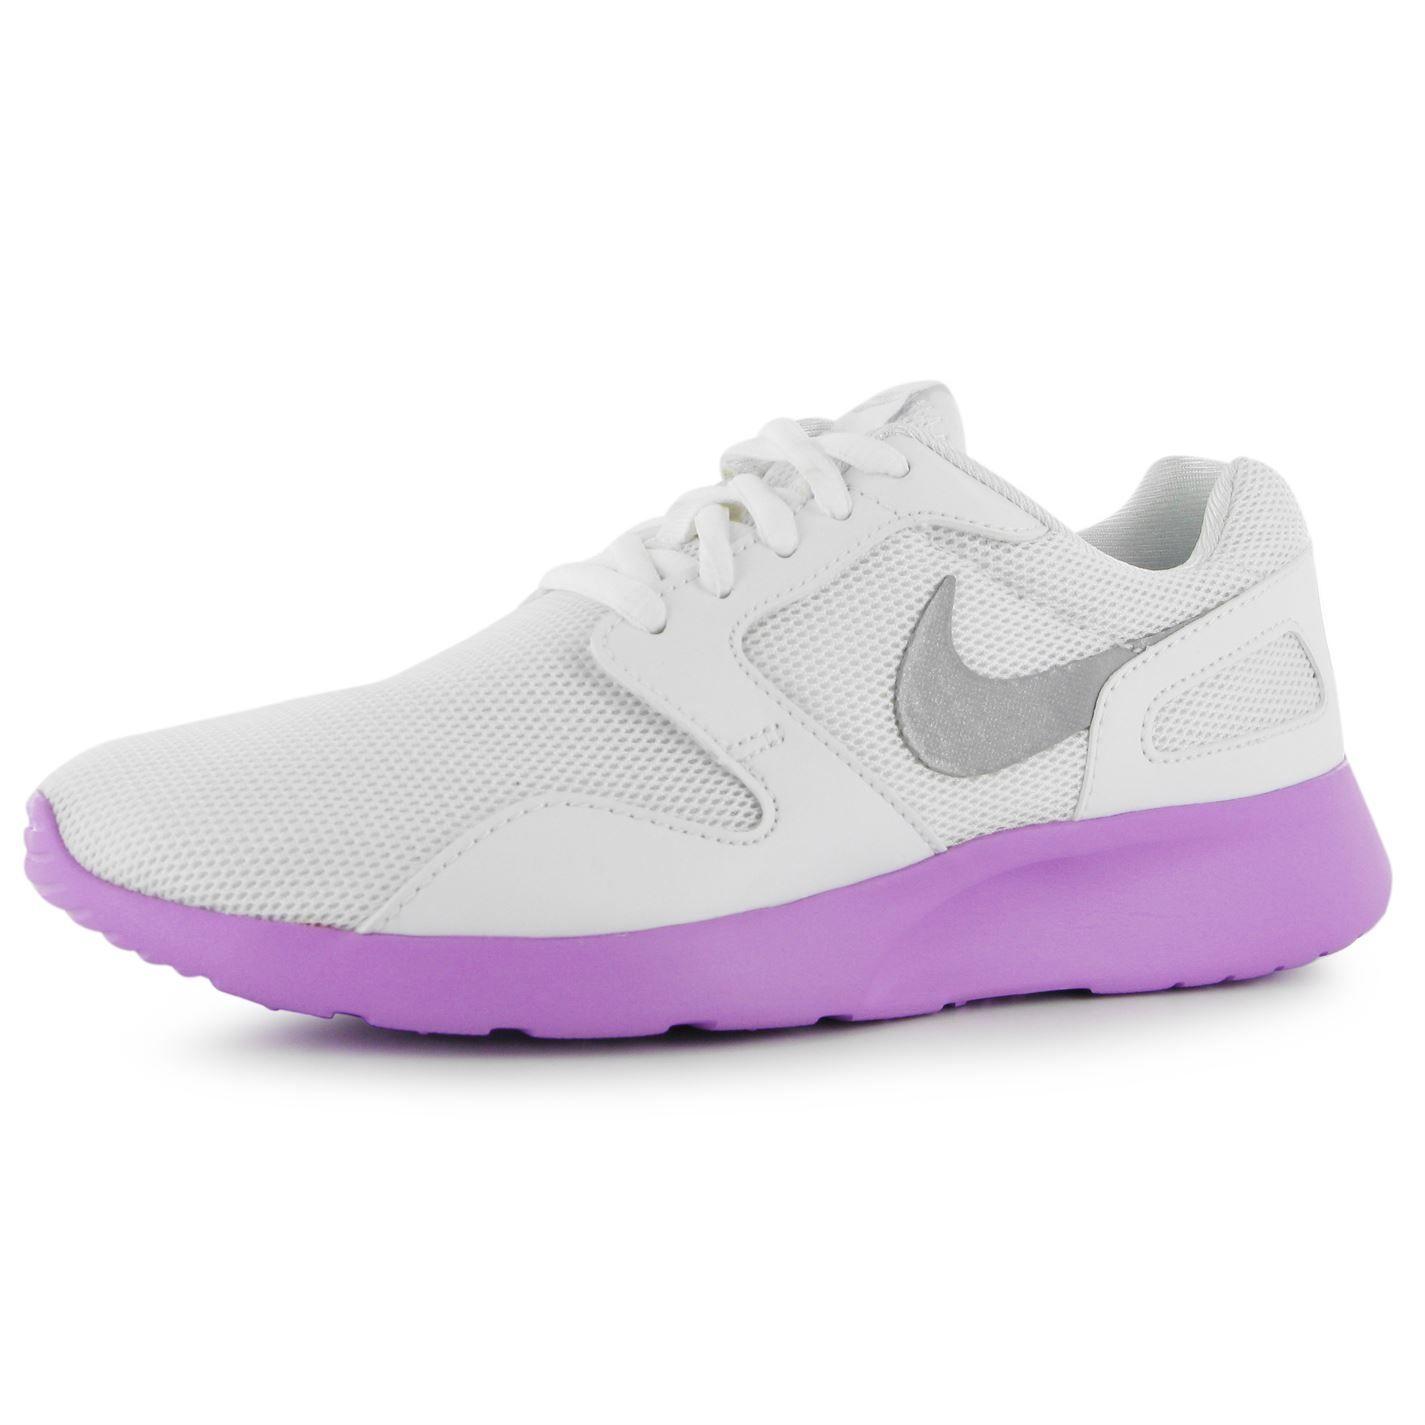 Nike Kaishi Run Ladies Trainers